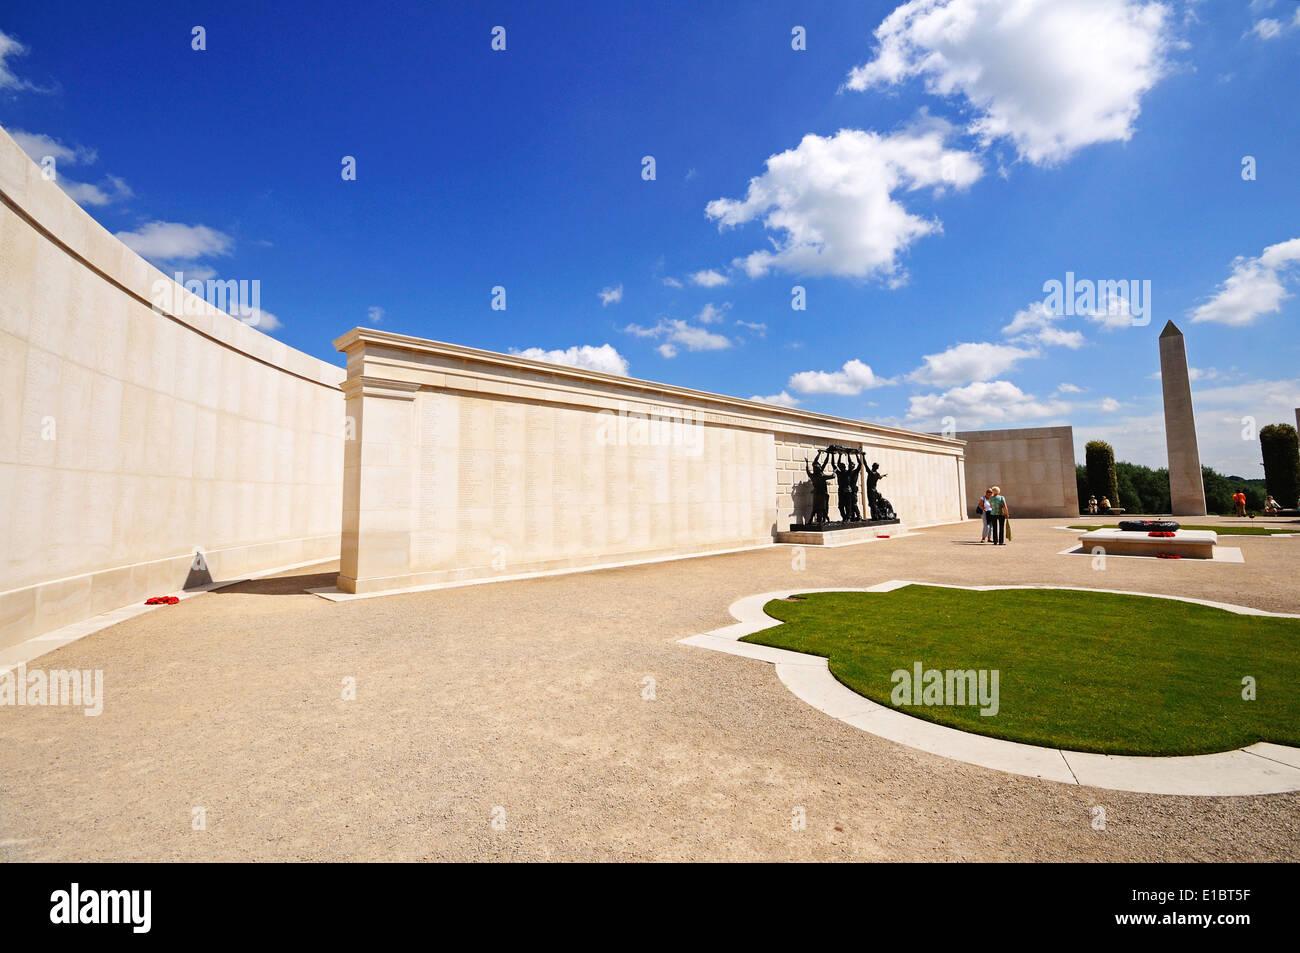 View inside the inner circle of the Armed Forces Memorial, National Memorial Arboretum, Alrewas, UK. - Stock Image